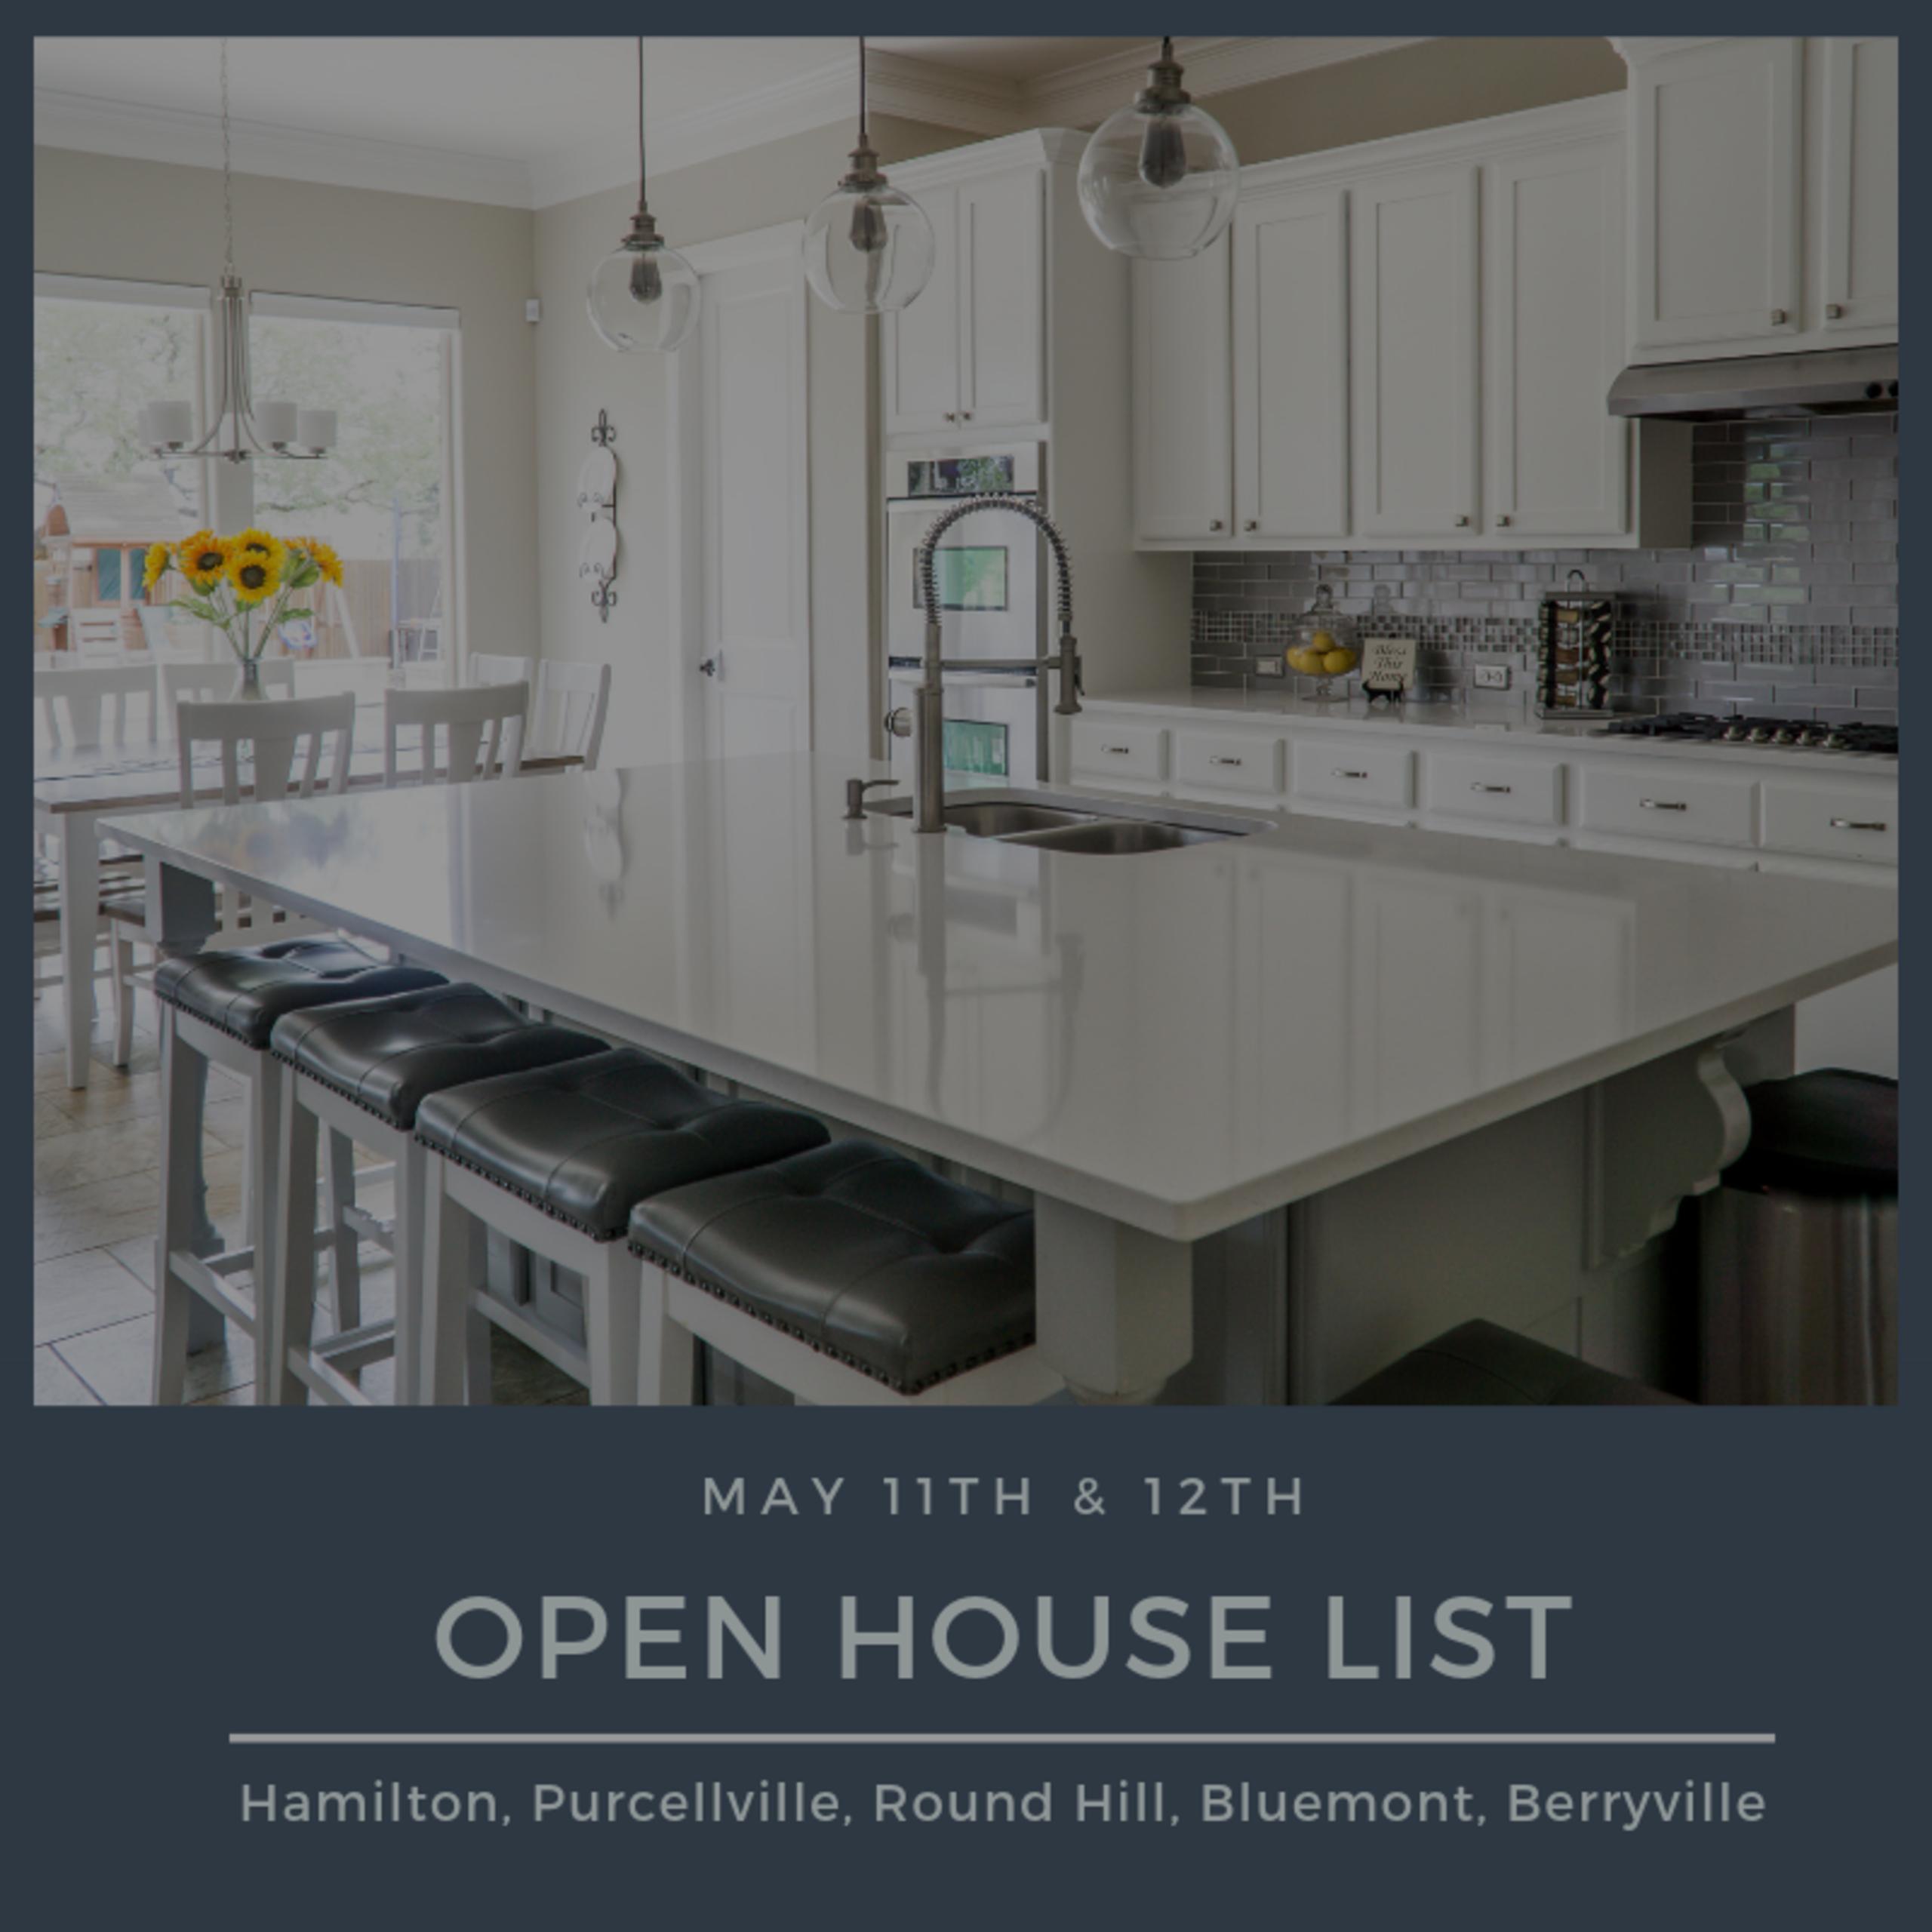 Open House List 5/11/19 – 5/12/19